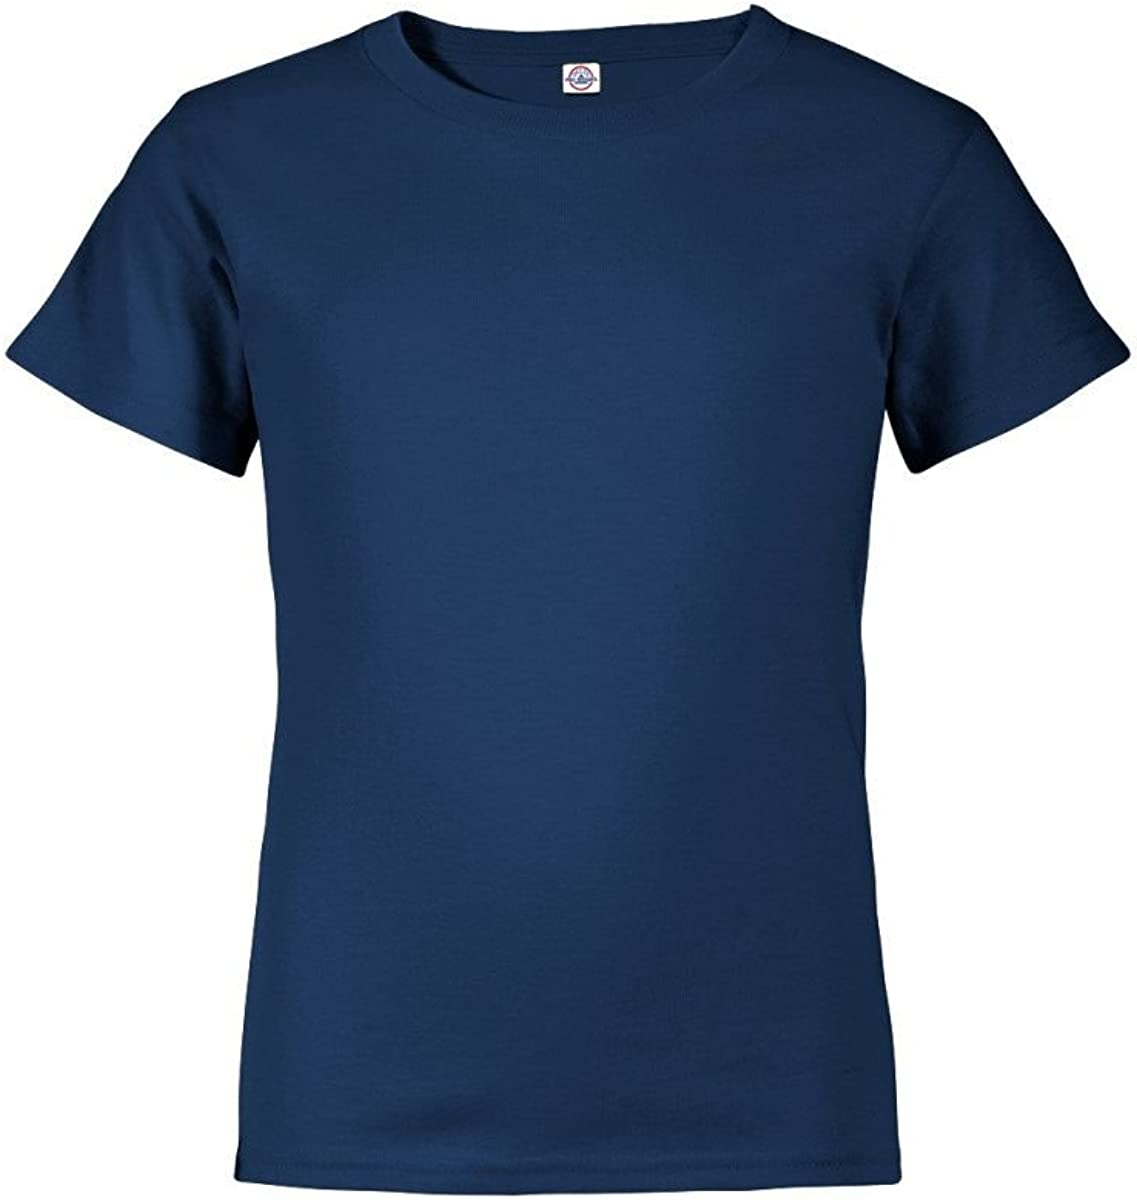 Delta Boy's Pro Weight 5.2 oz Retail Fit Tee, Ath, XS